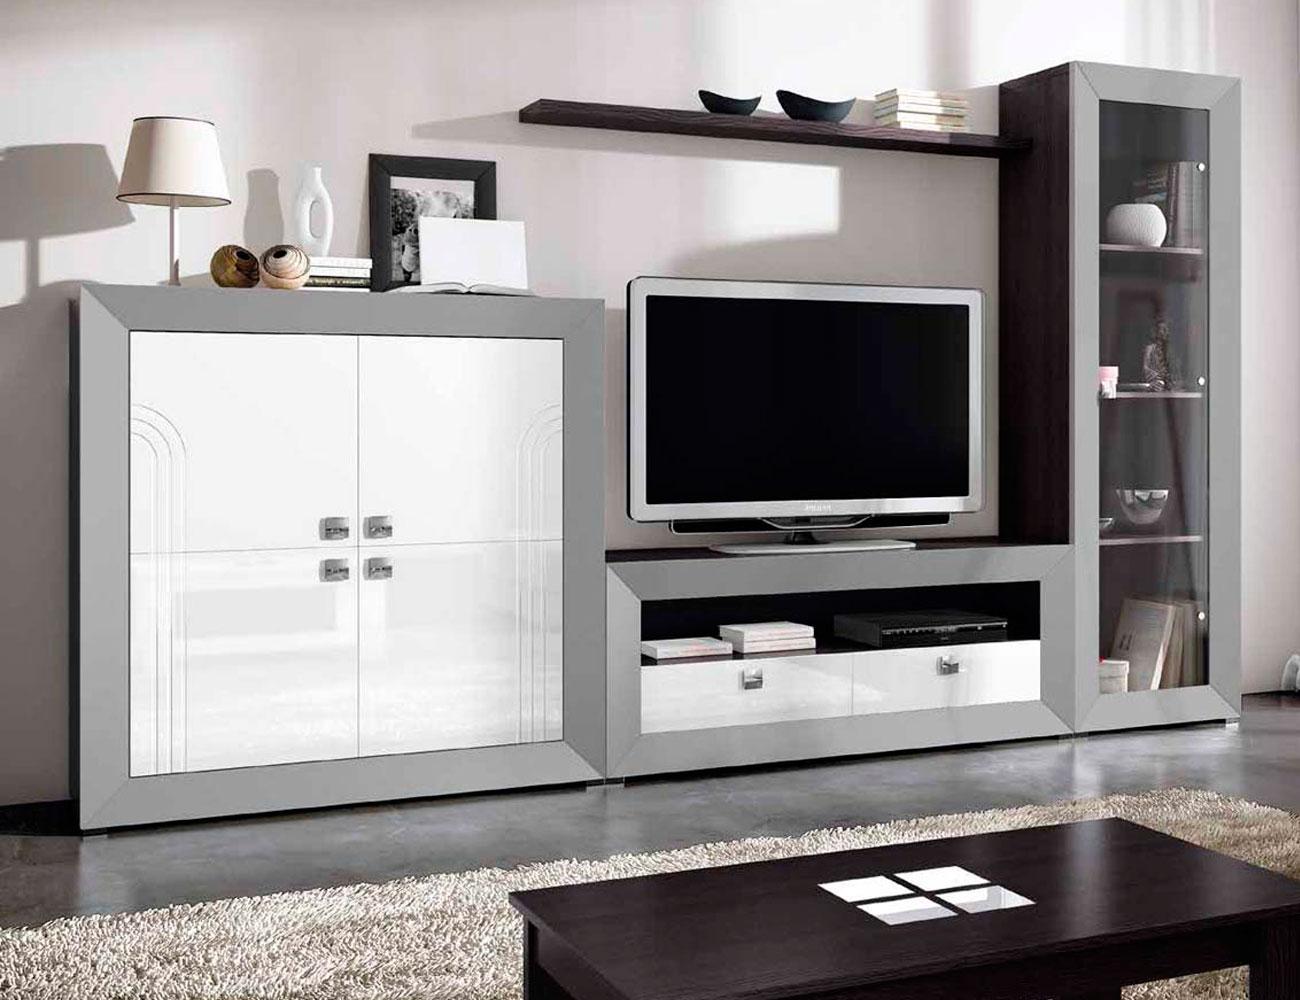 Mueble salon moderno 041